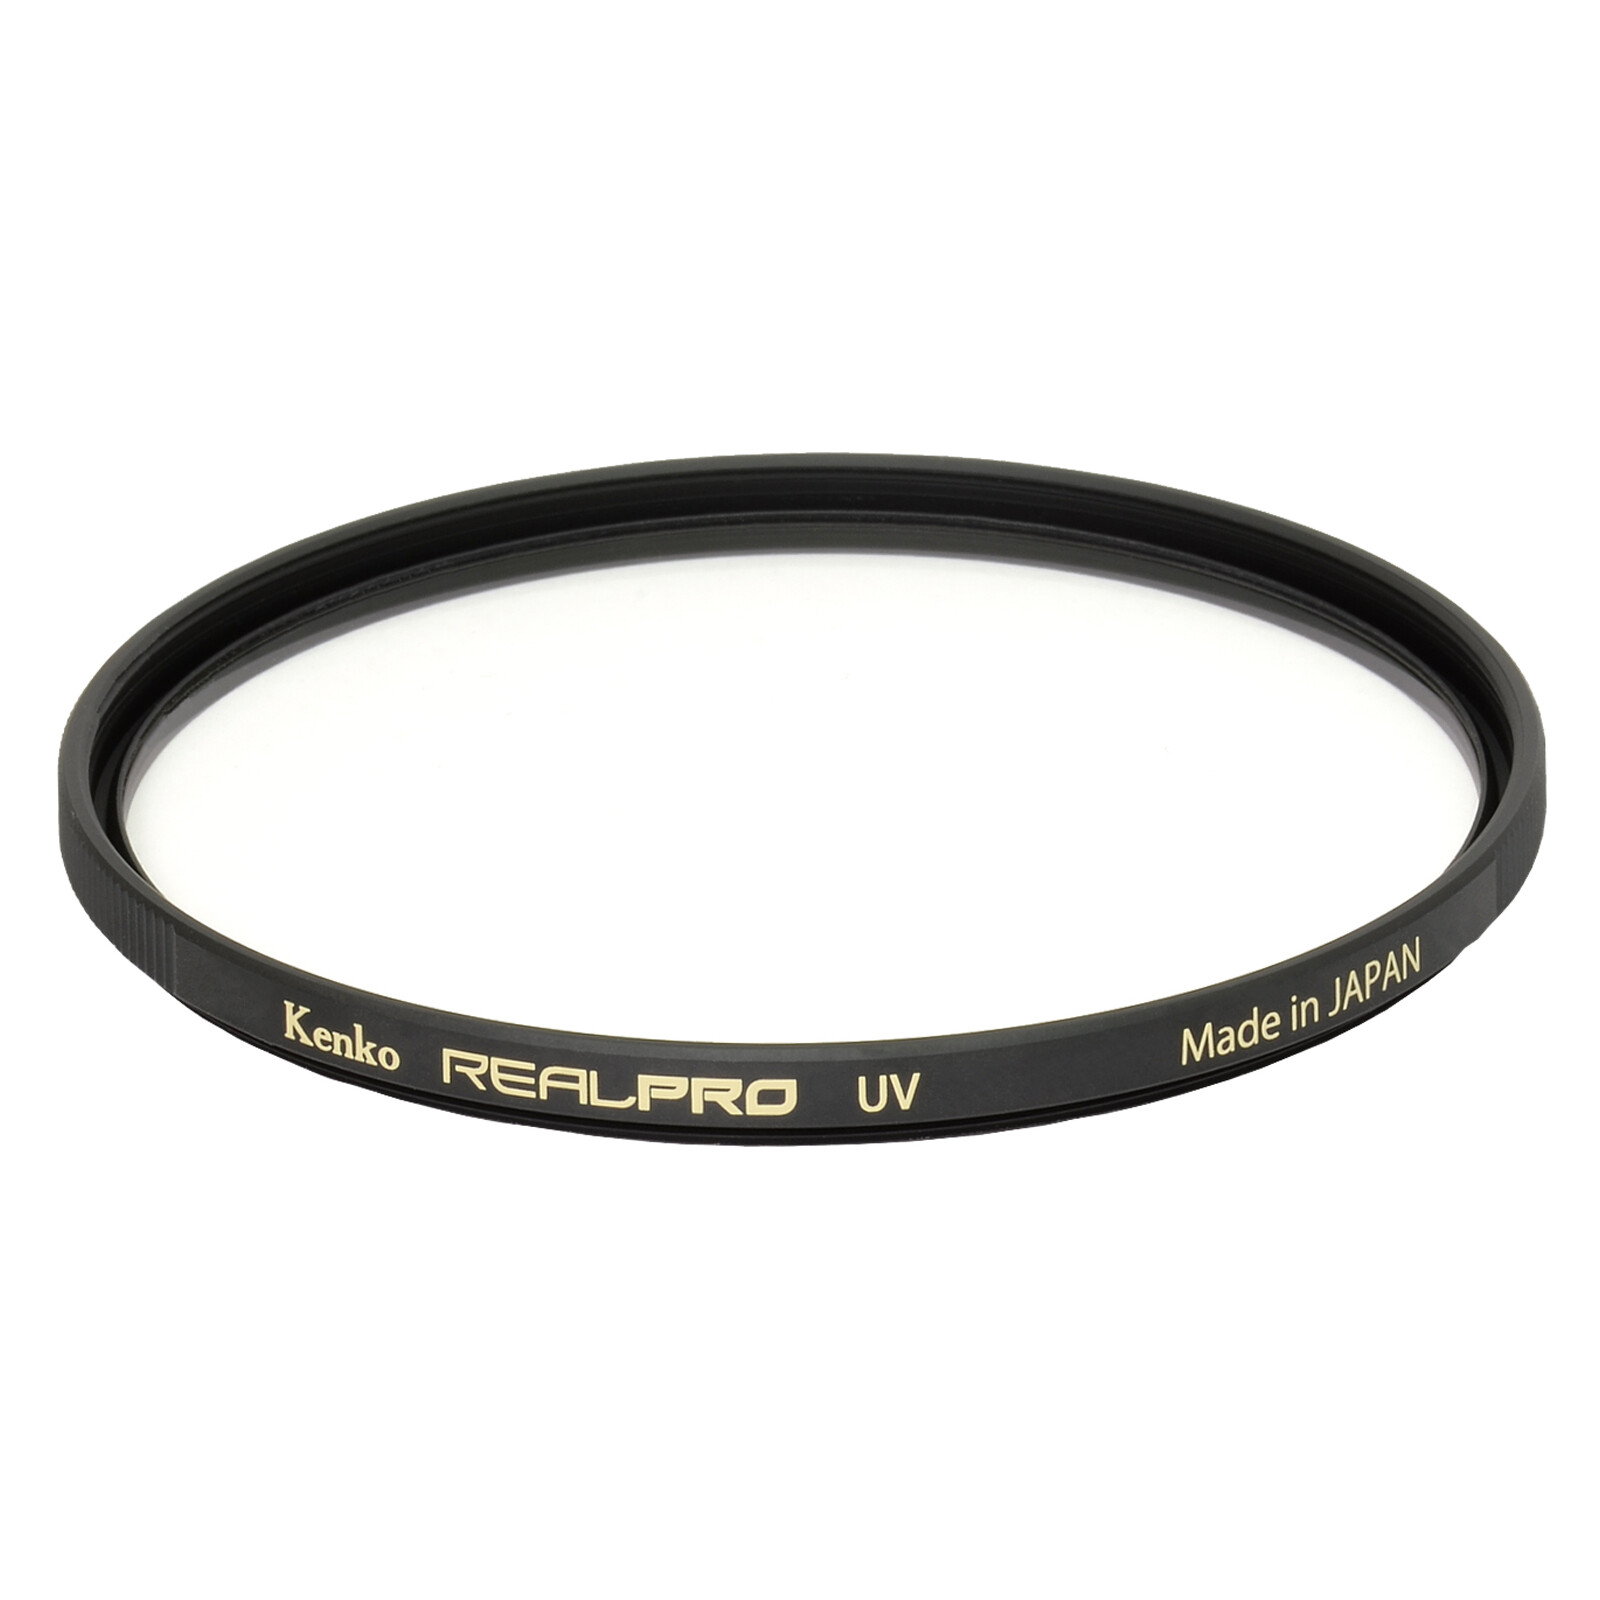 Kenko Real Pro UV 49mm Slim